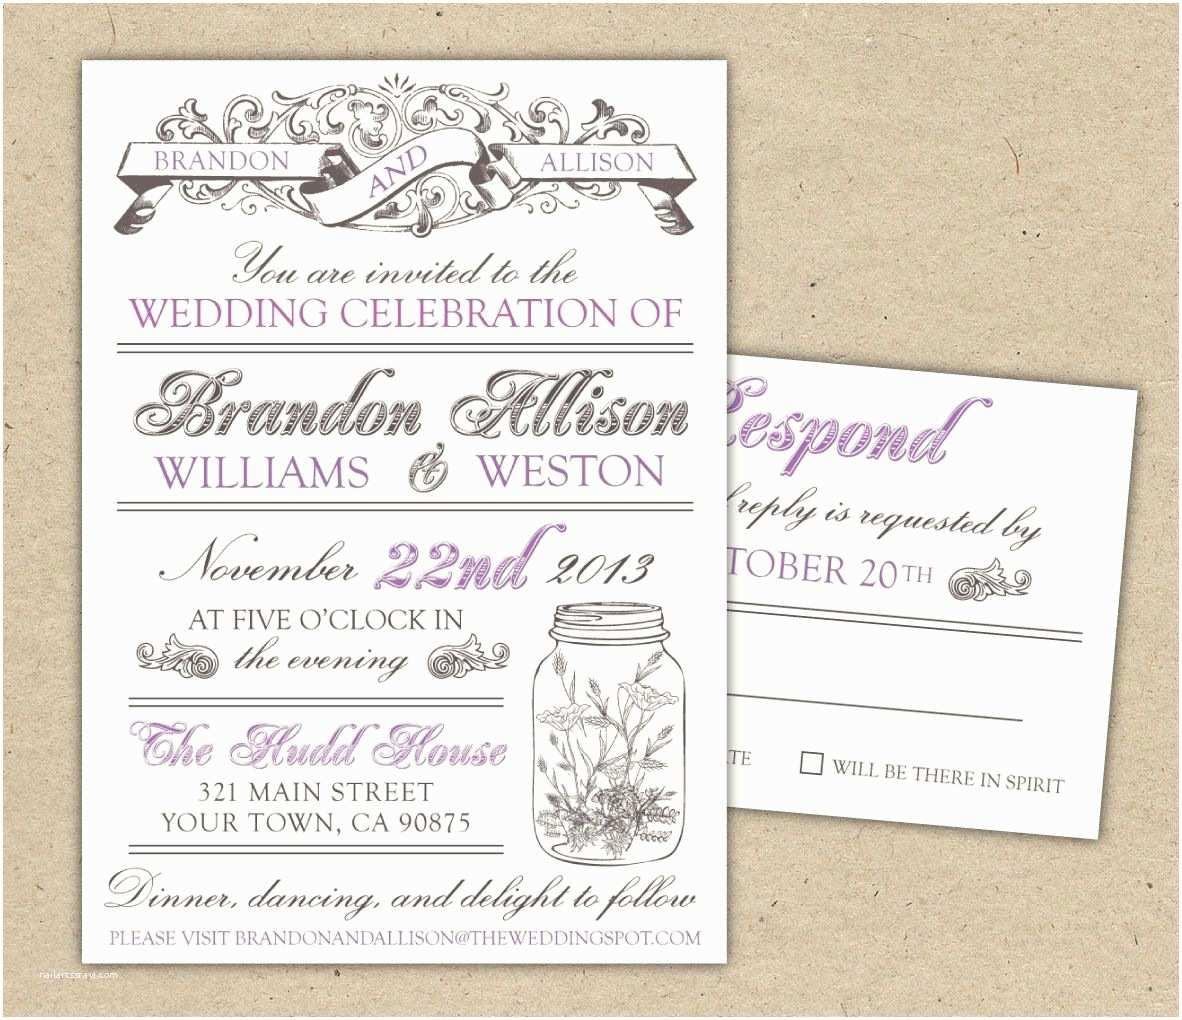 Funny Wedding Invitation Templates Free Free Templates for Invitations